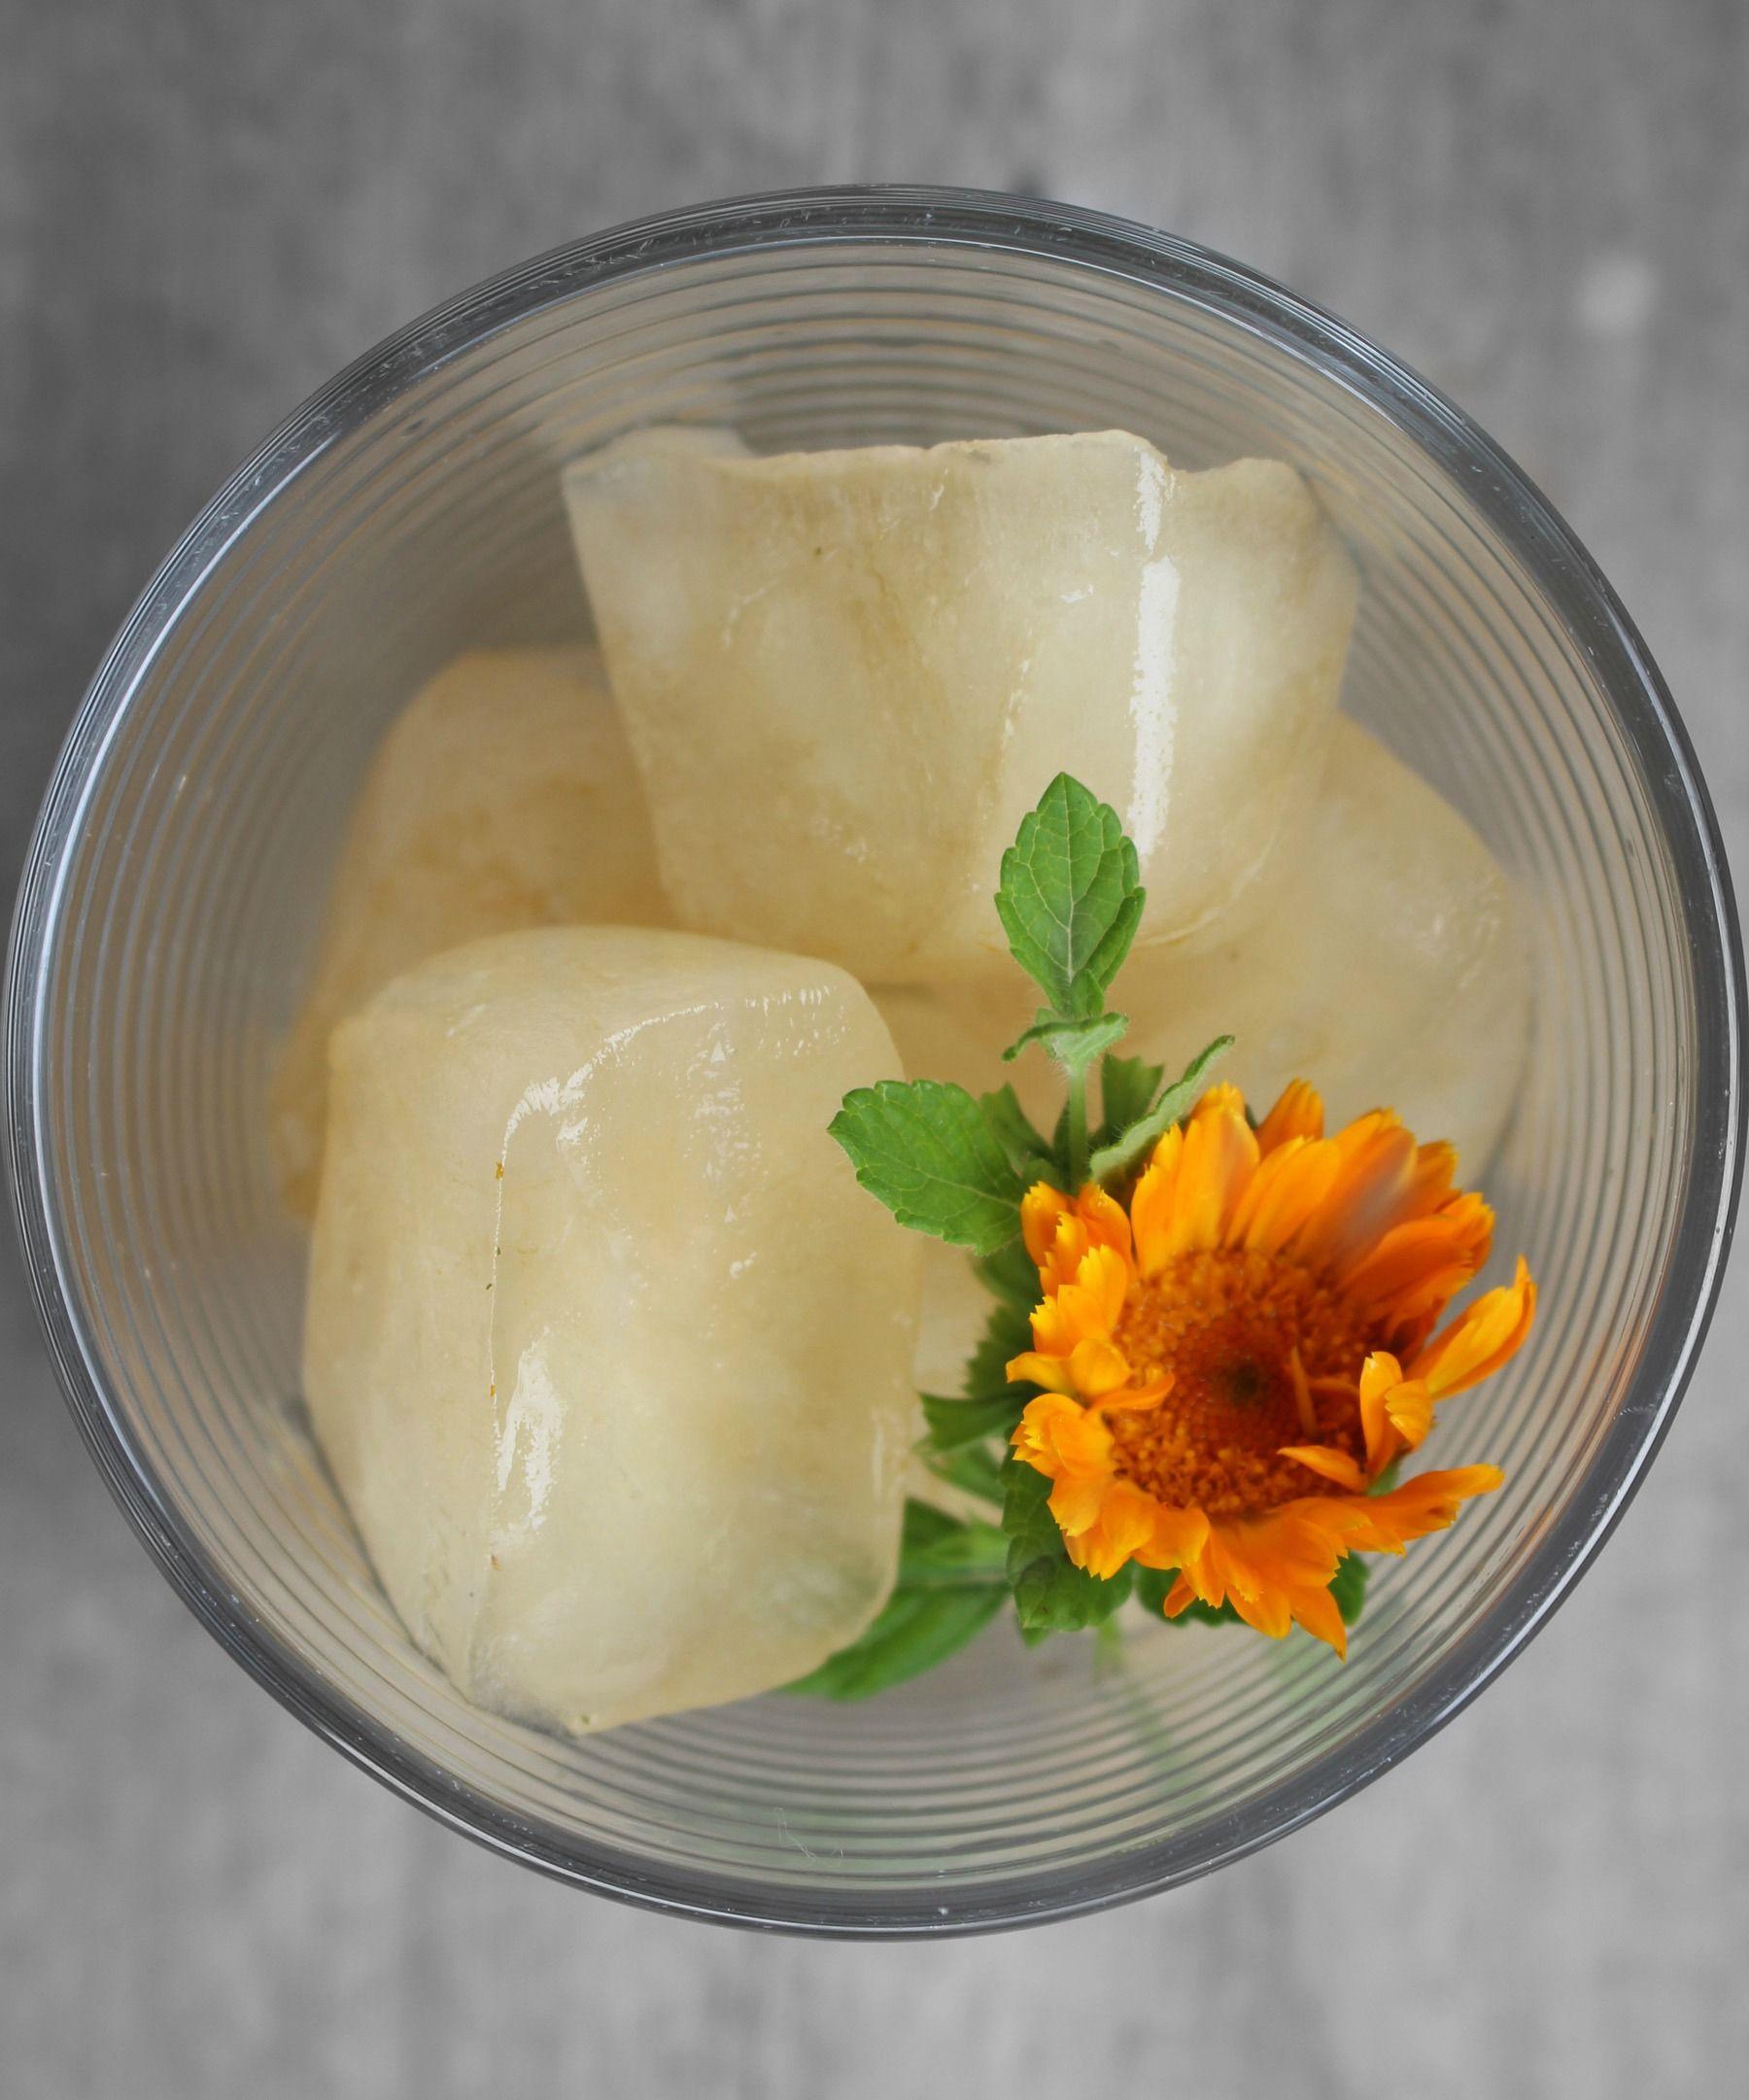 14 Uses for Calendula Tea Calendula tea, Edible flowers